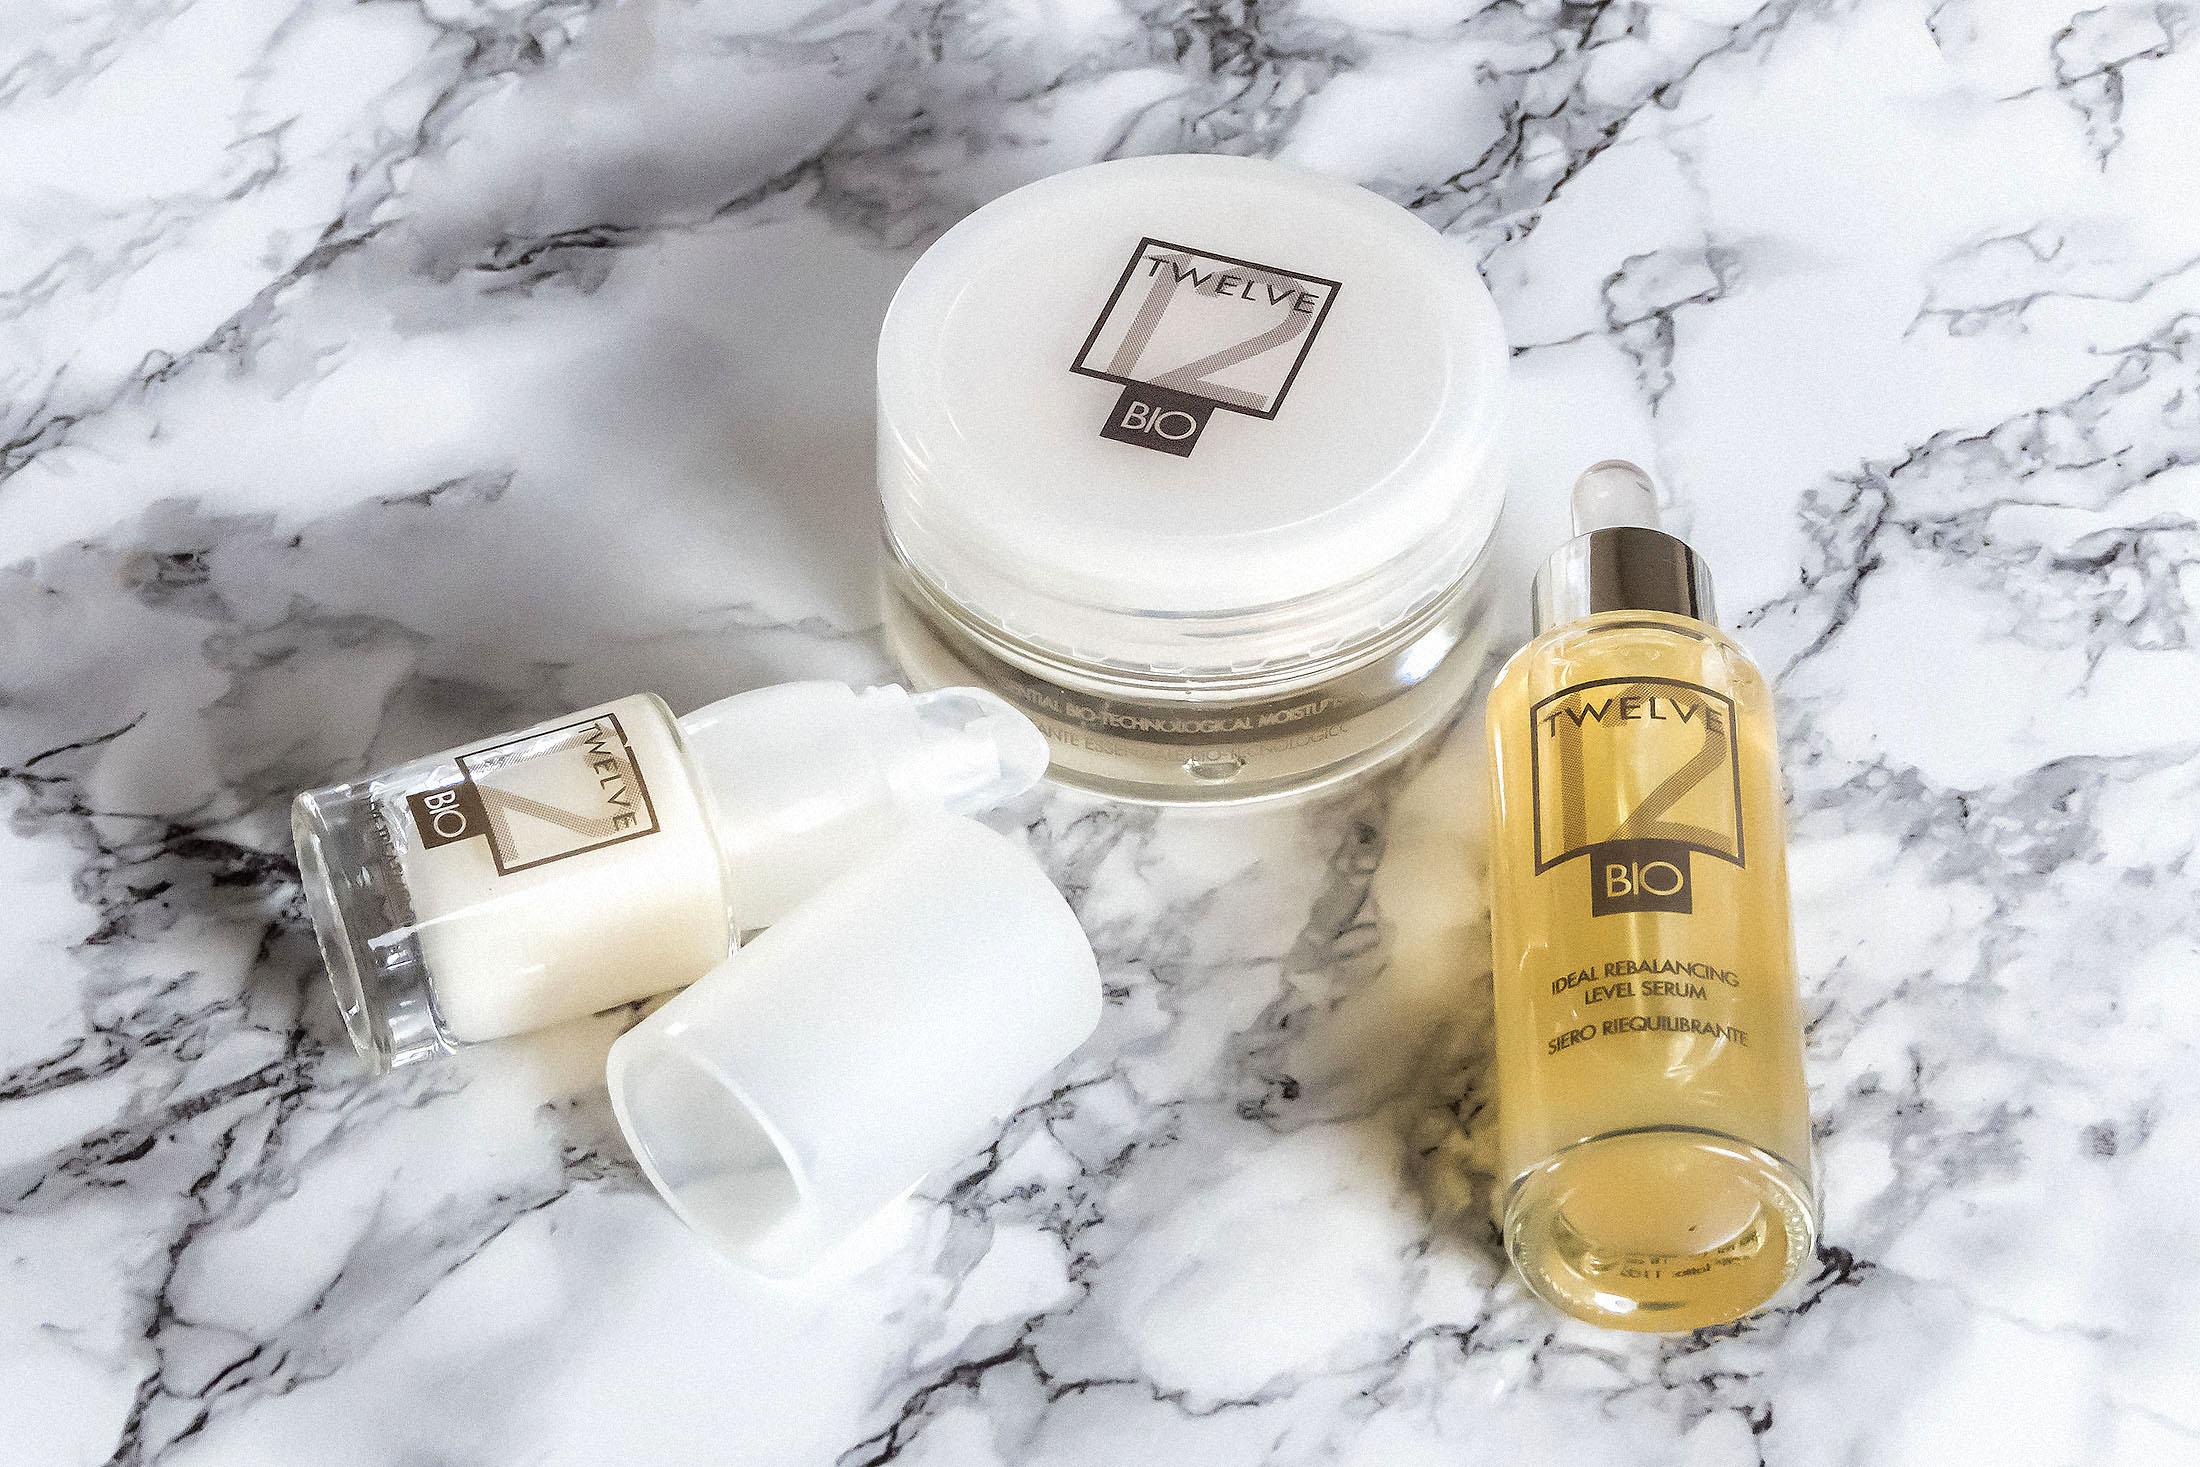 Reparative Skin Care by Twelve Beauty